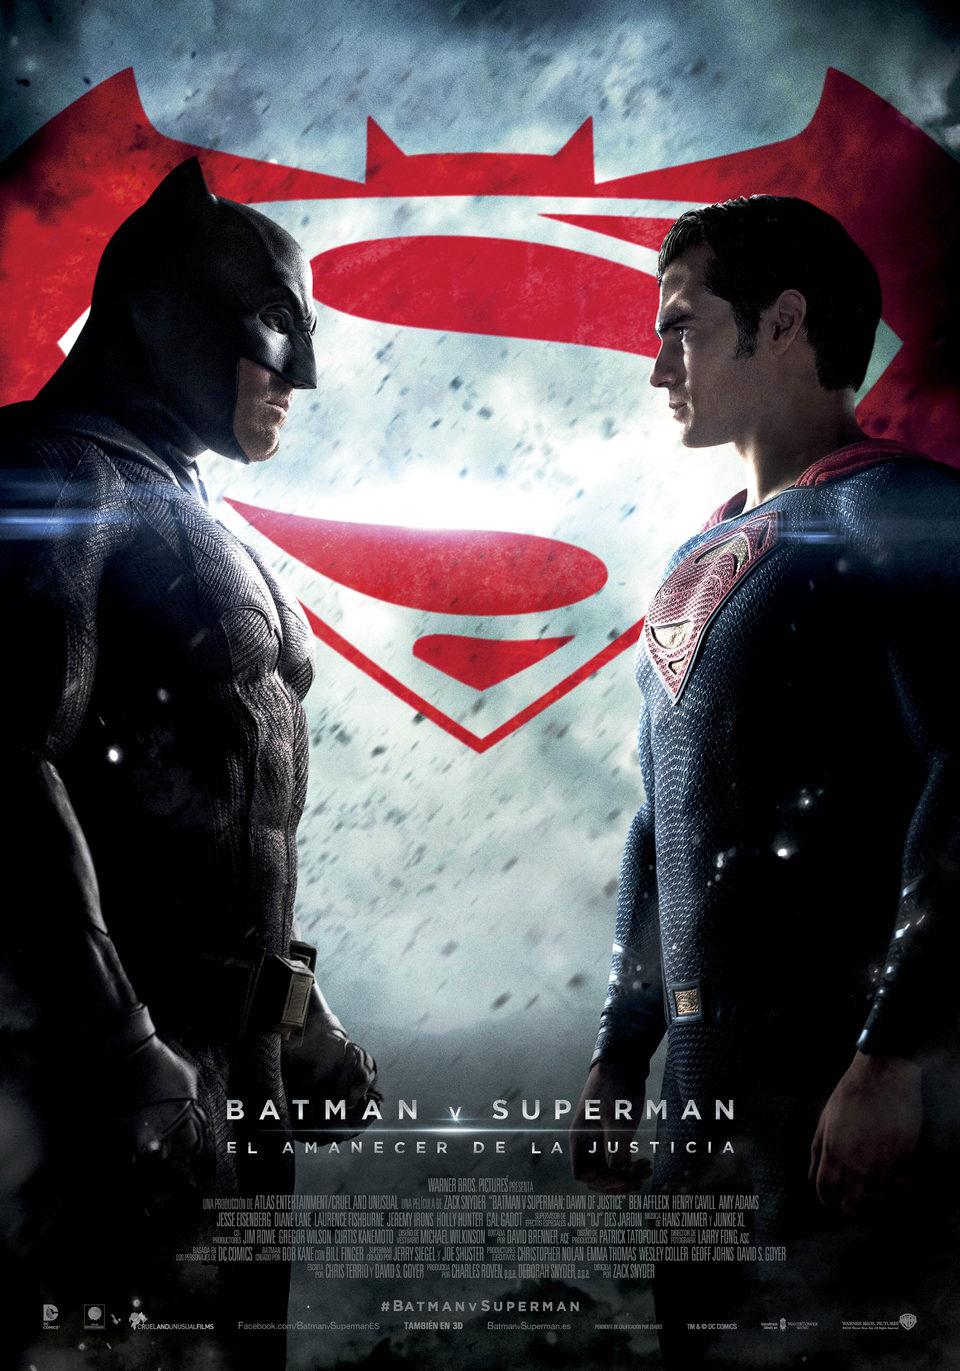 España Oficial poster for Batman v Superman: Dawn of Justice